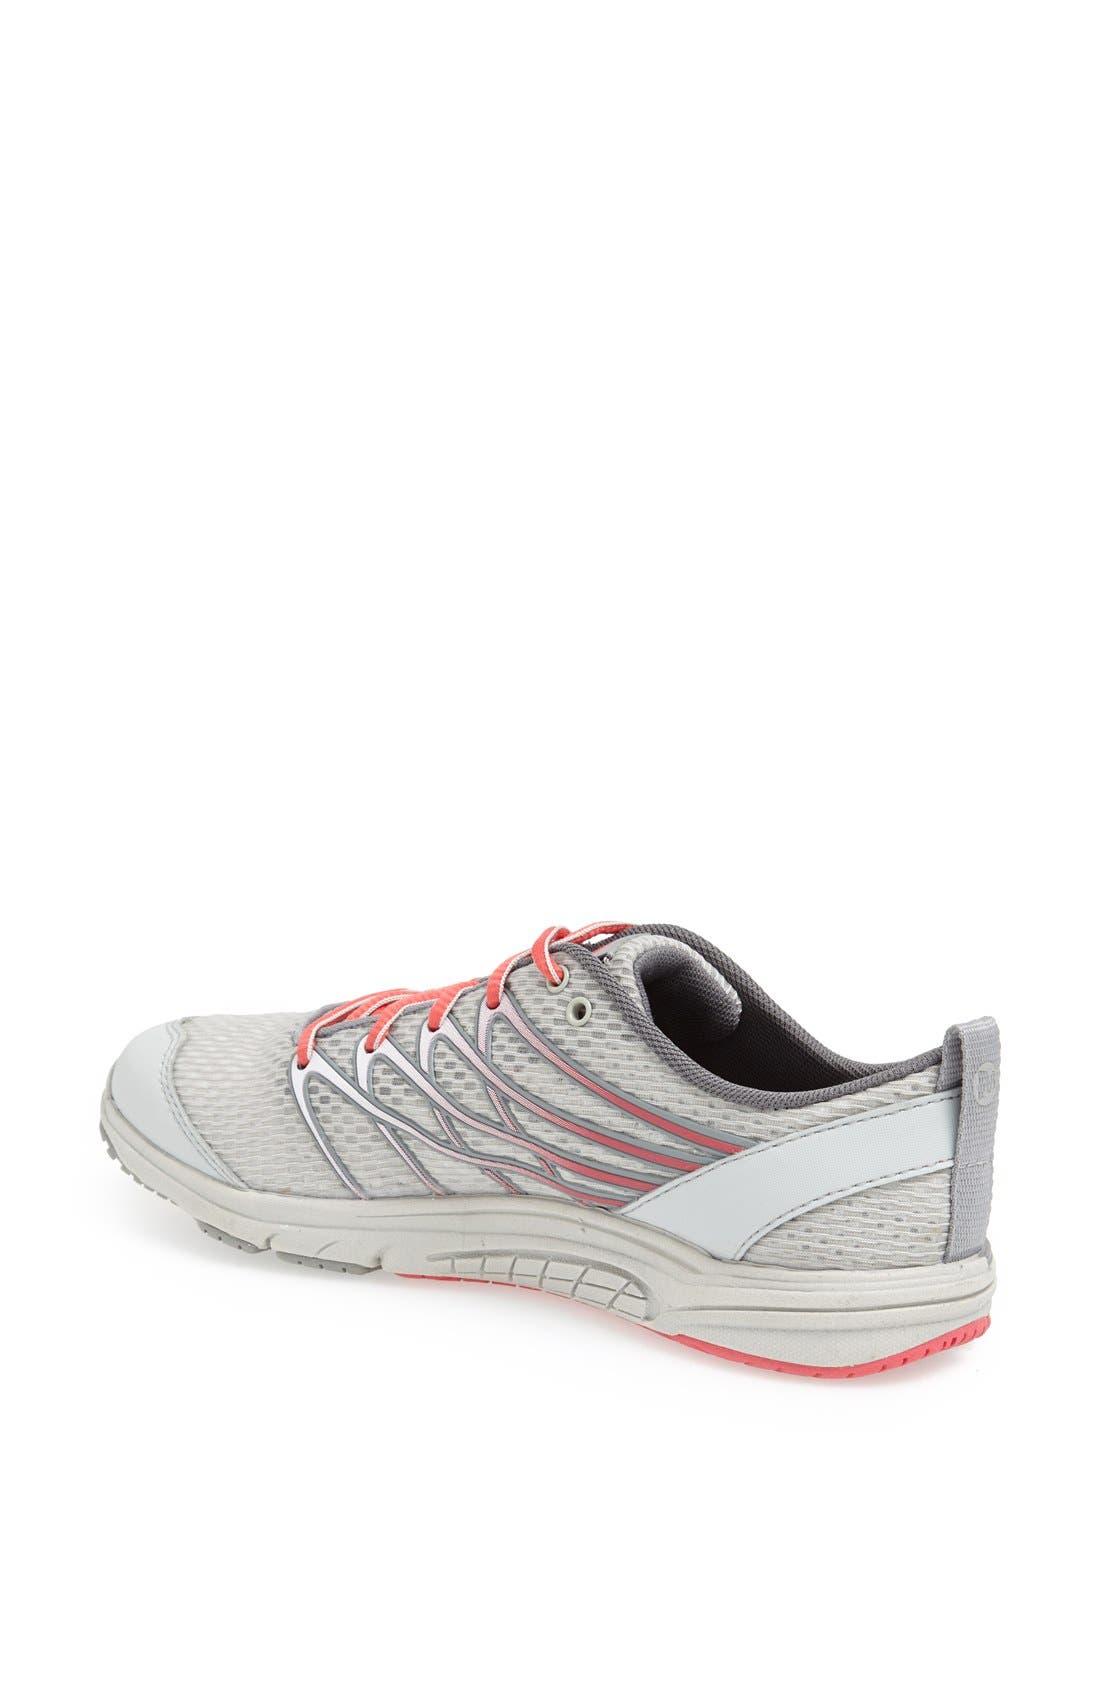 Alternate Image 2  - Merrell 'Bare Access Arc 3' Running Shoe (Women)